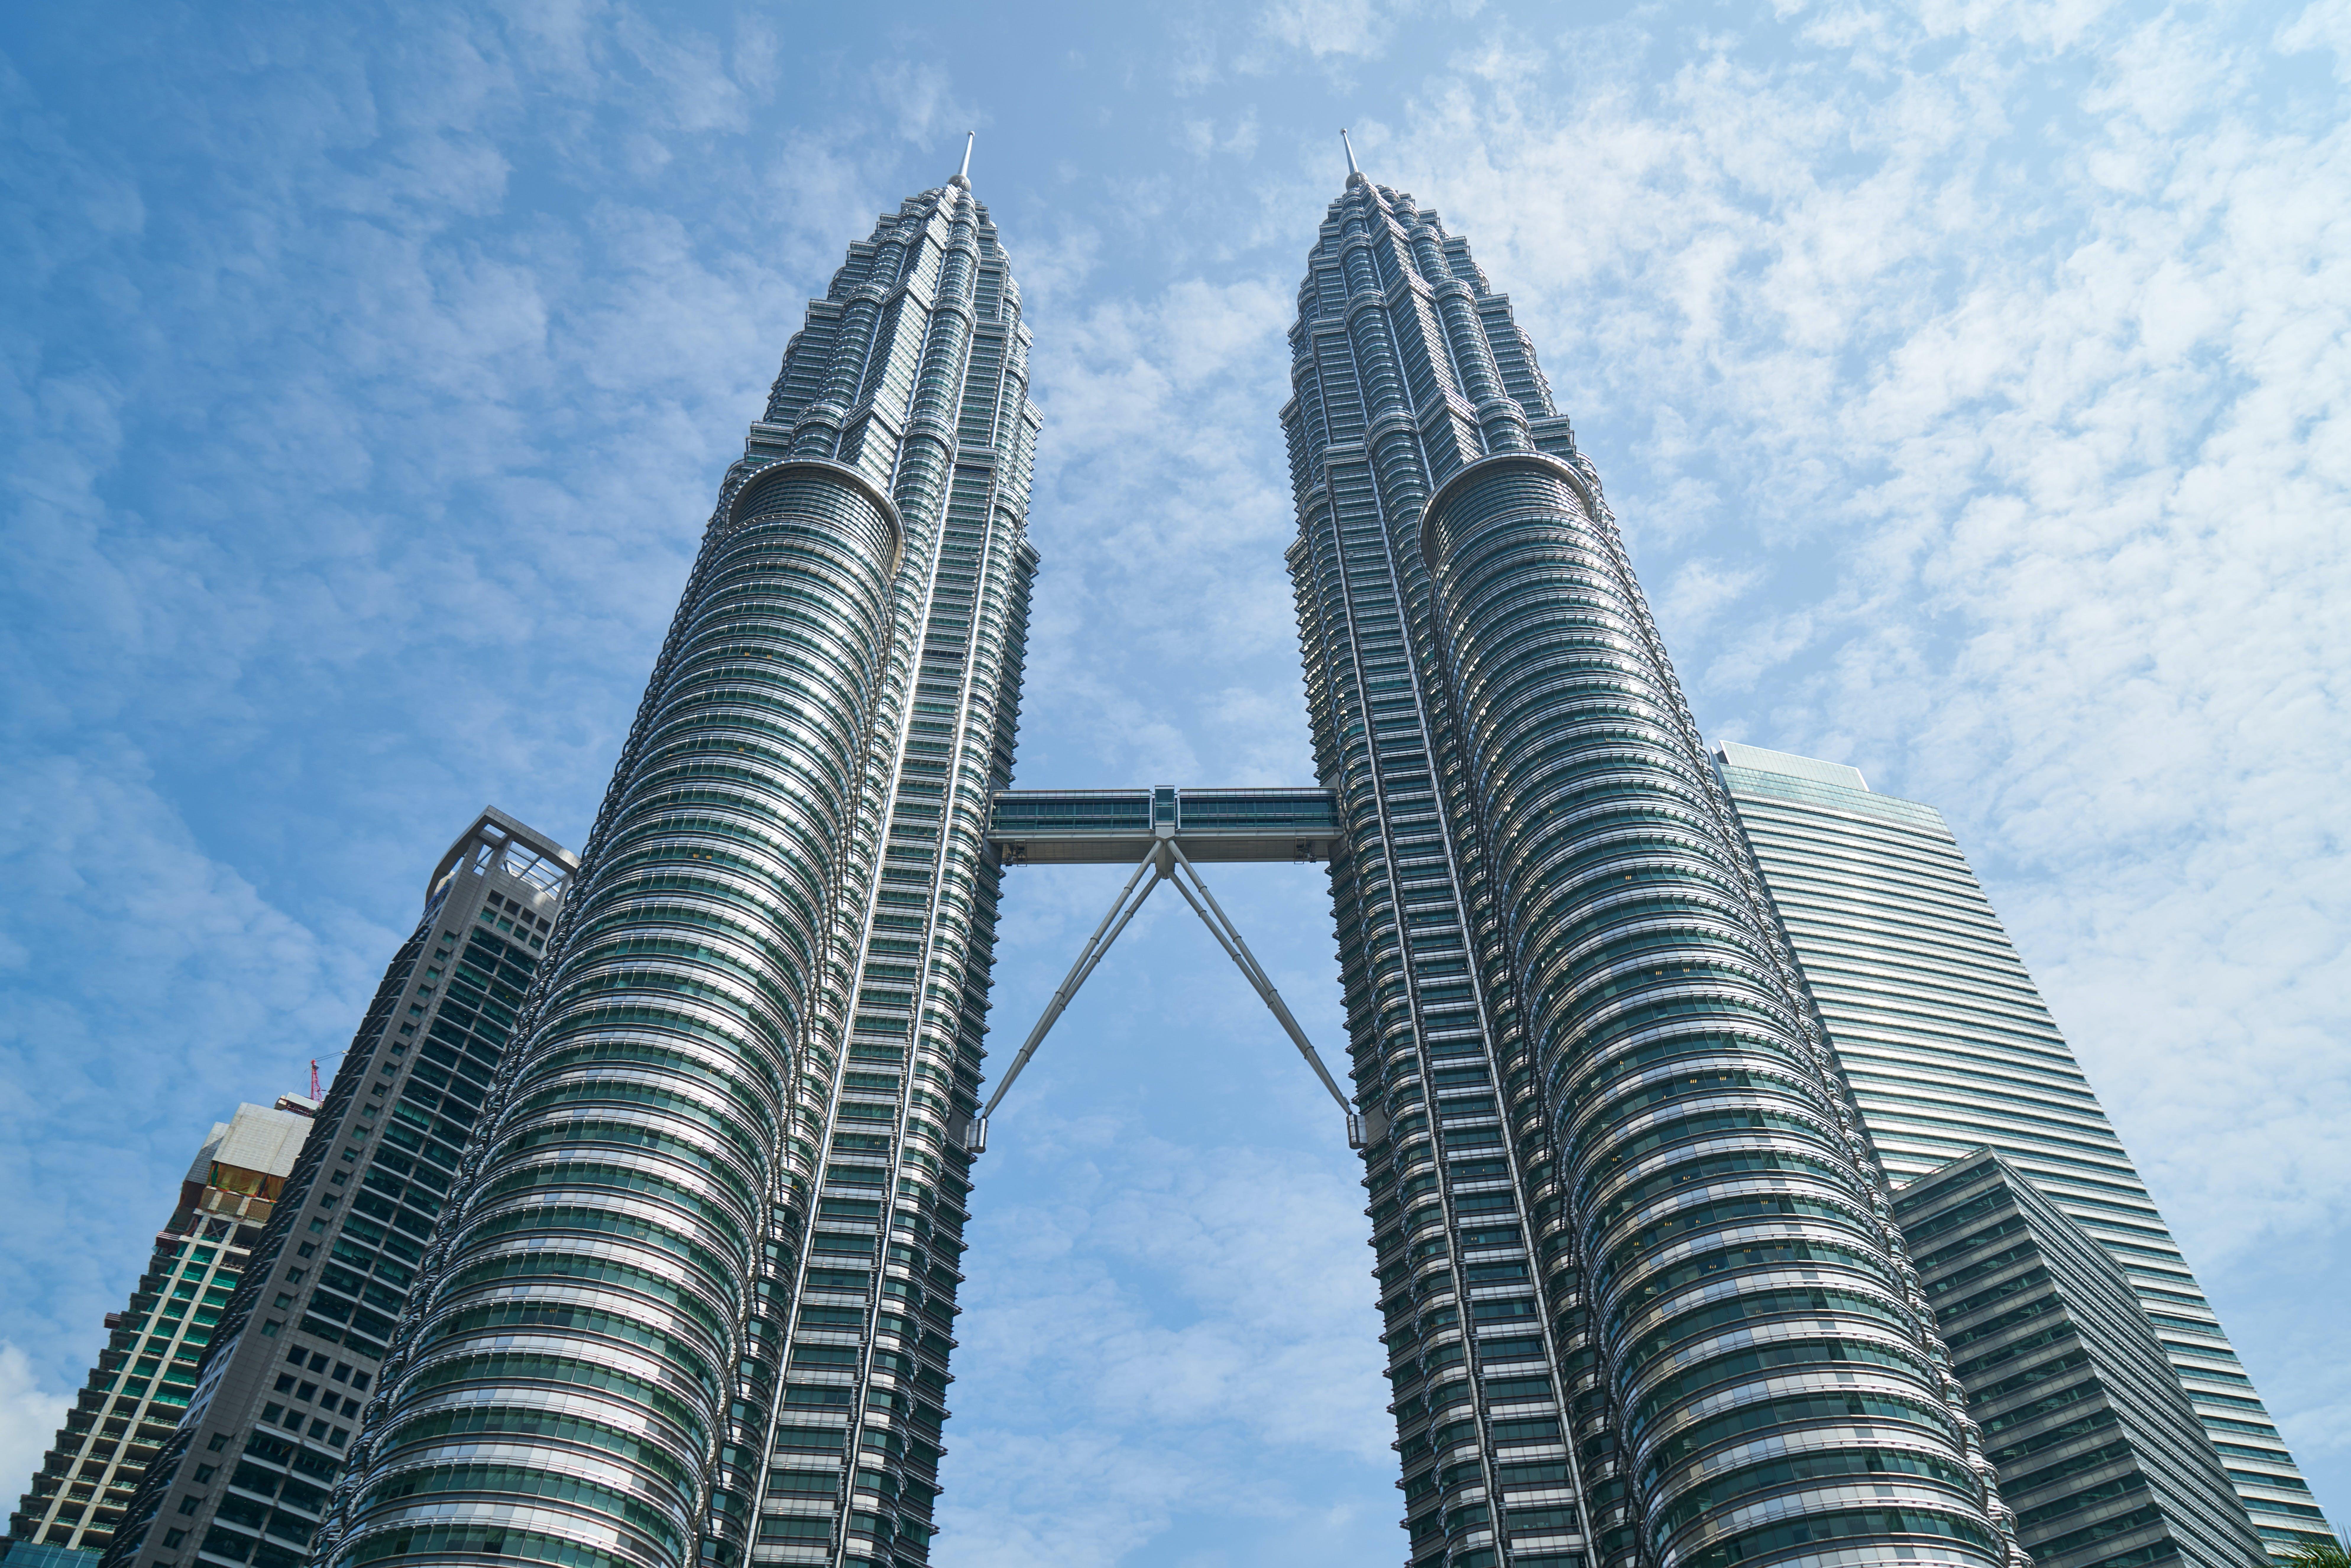 Foto stok gratis Arsitektur, Asia, awan, bagus